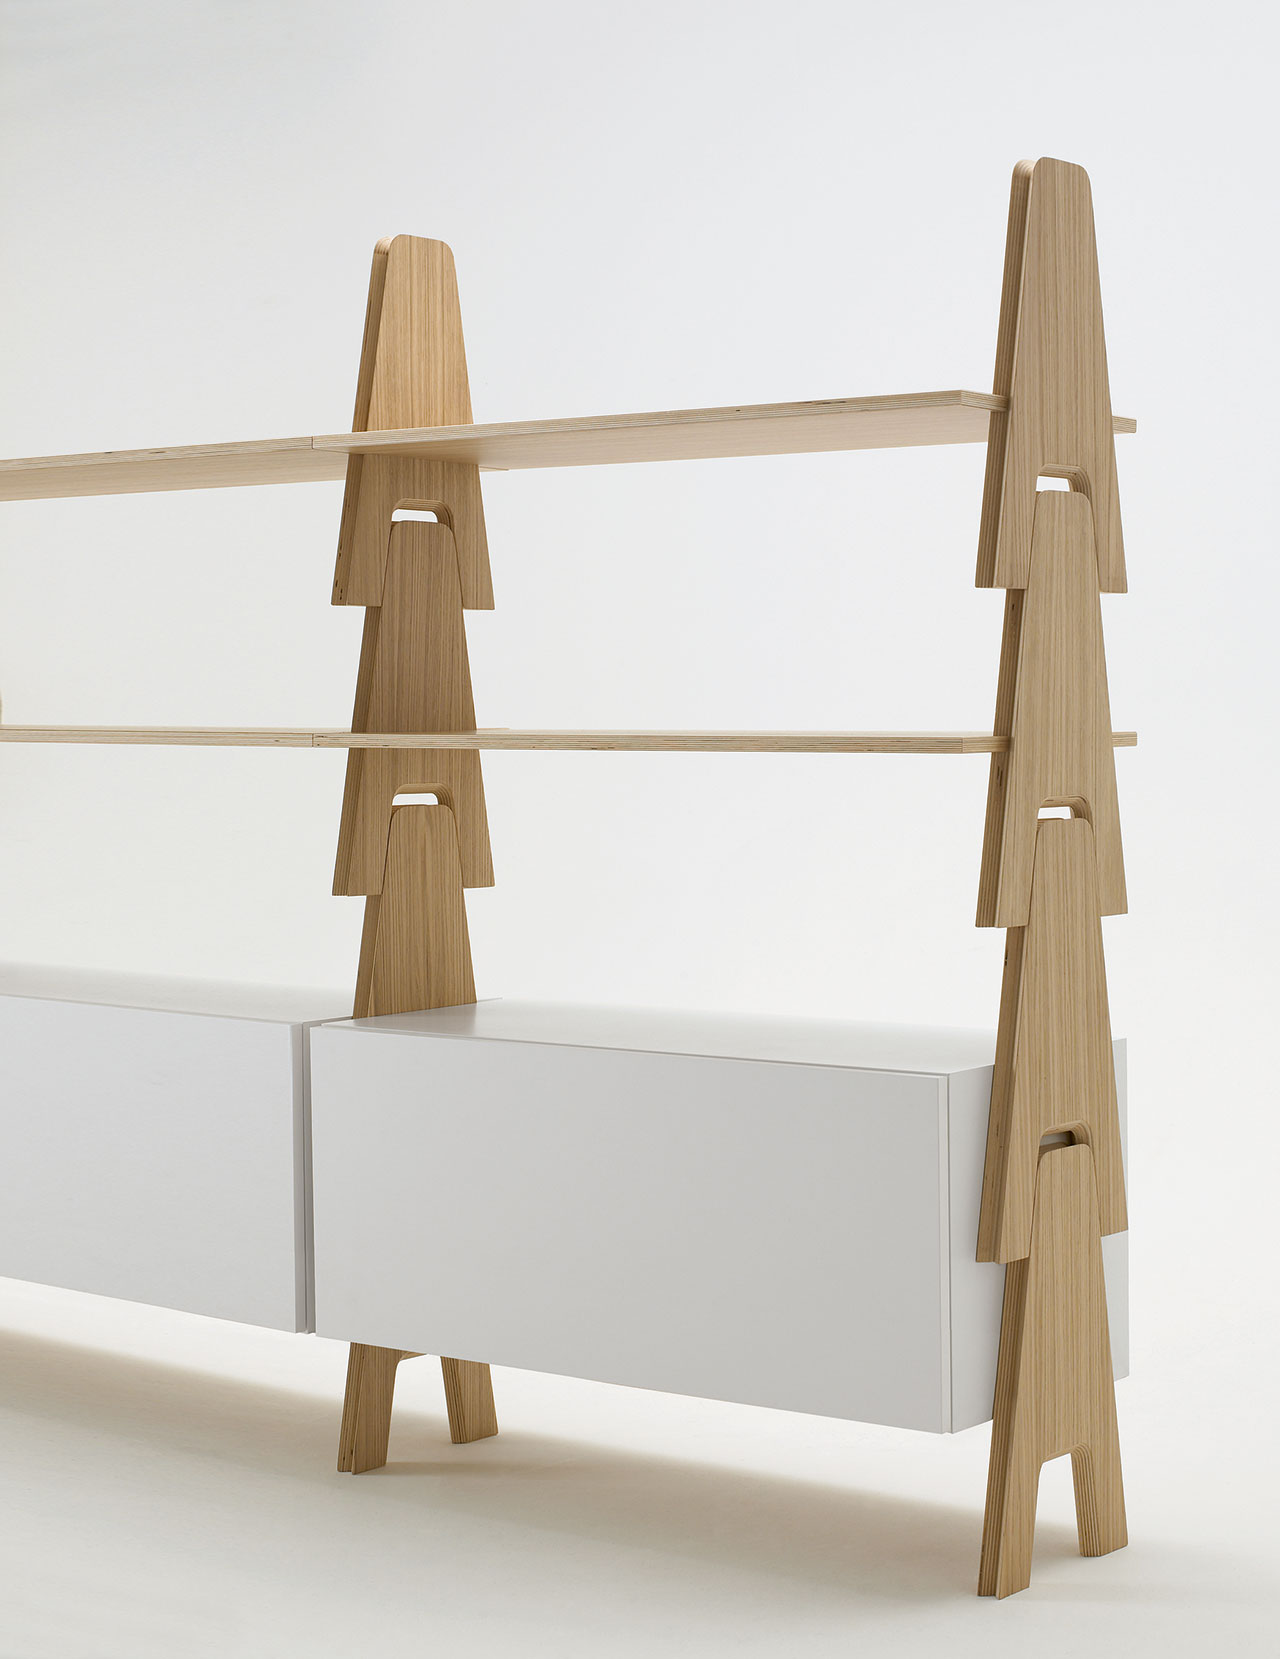 Cavalletto shelving system, The Mangiarotti Collection, Agapecasa© Agape